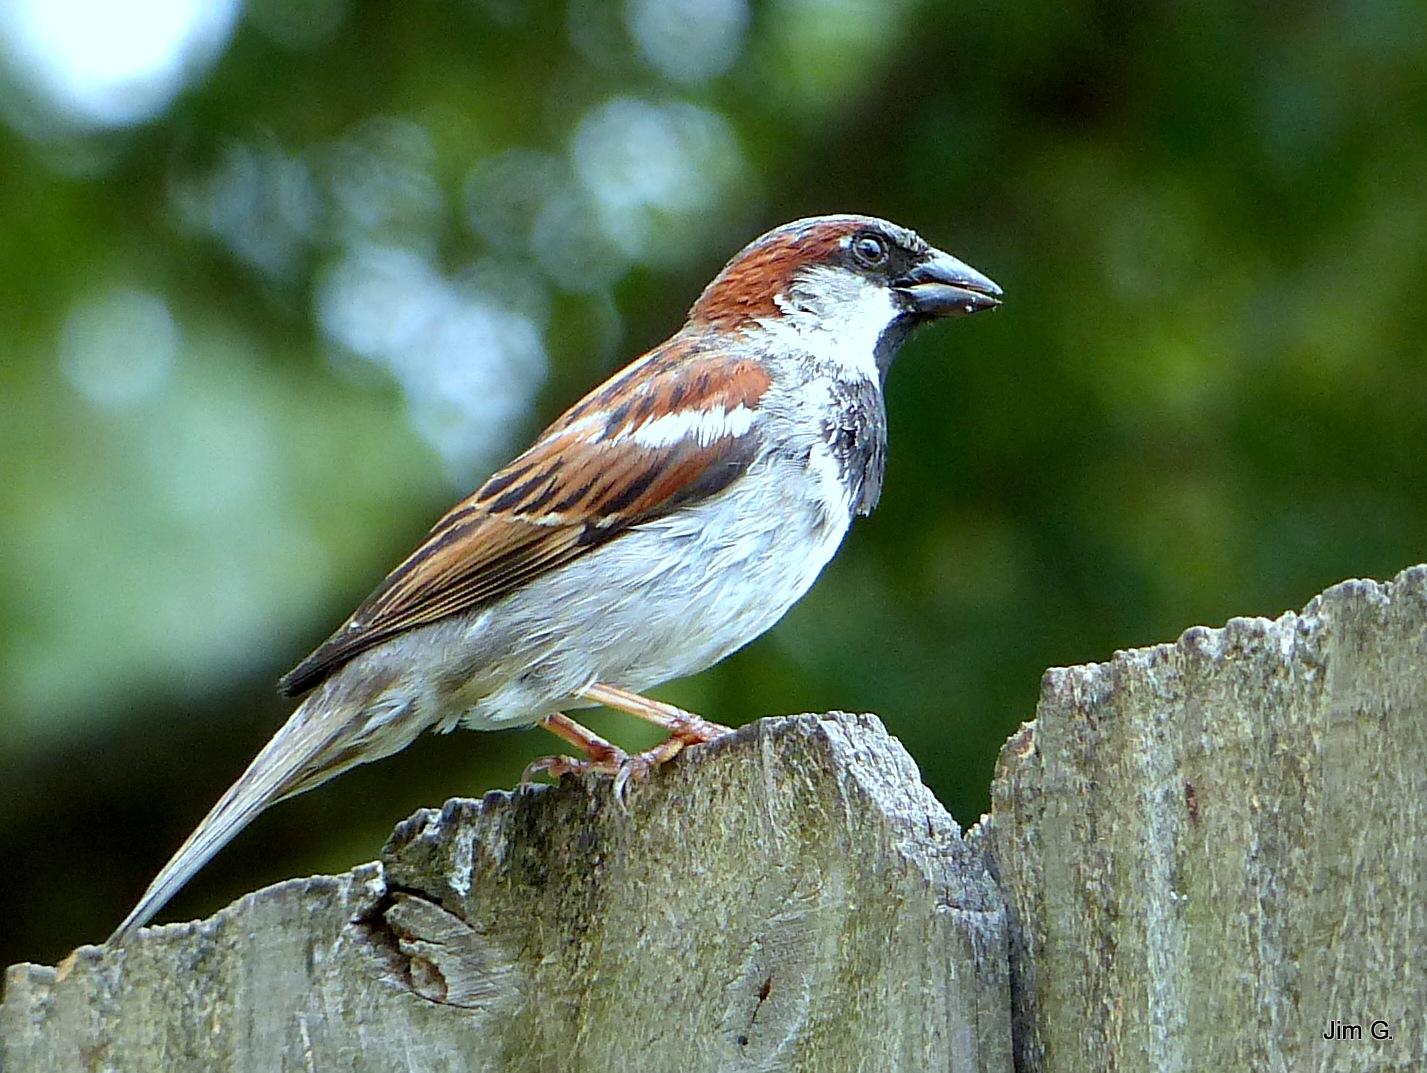 Alert Sparrow by Jim Graham